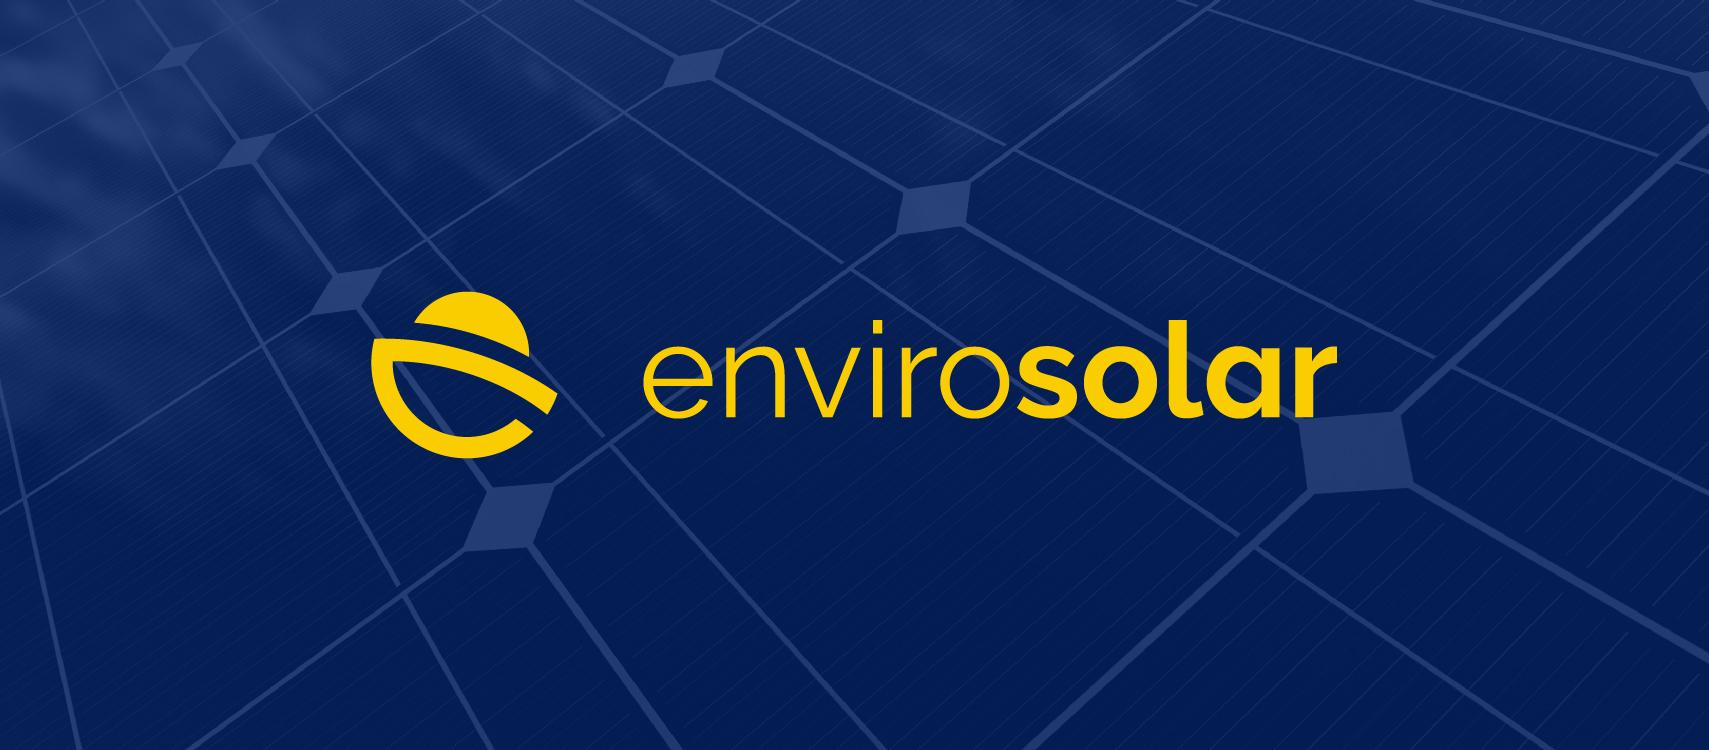 Envirosolar Power Customer Reviews